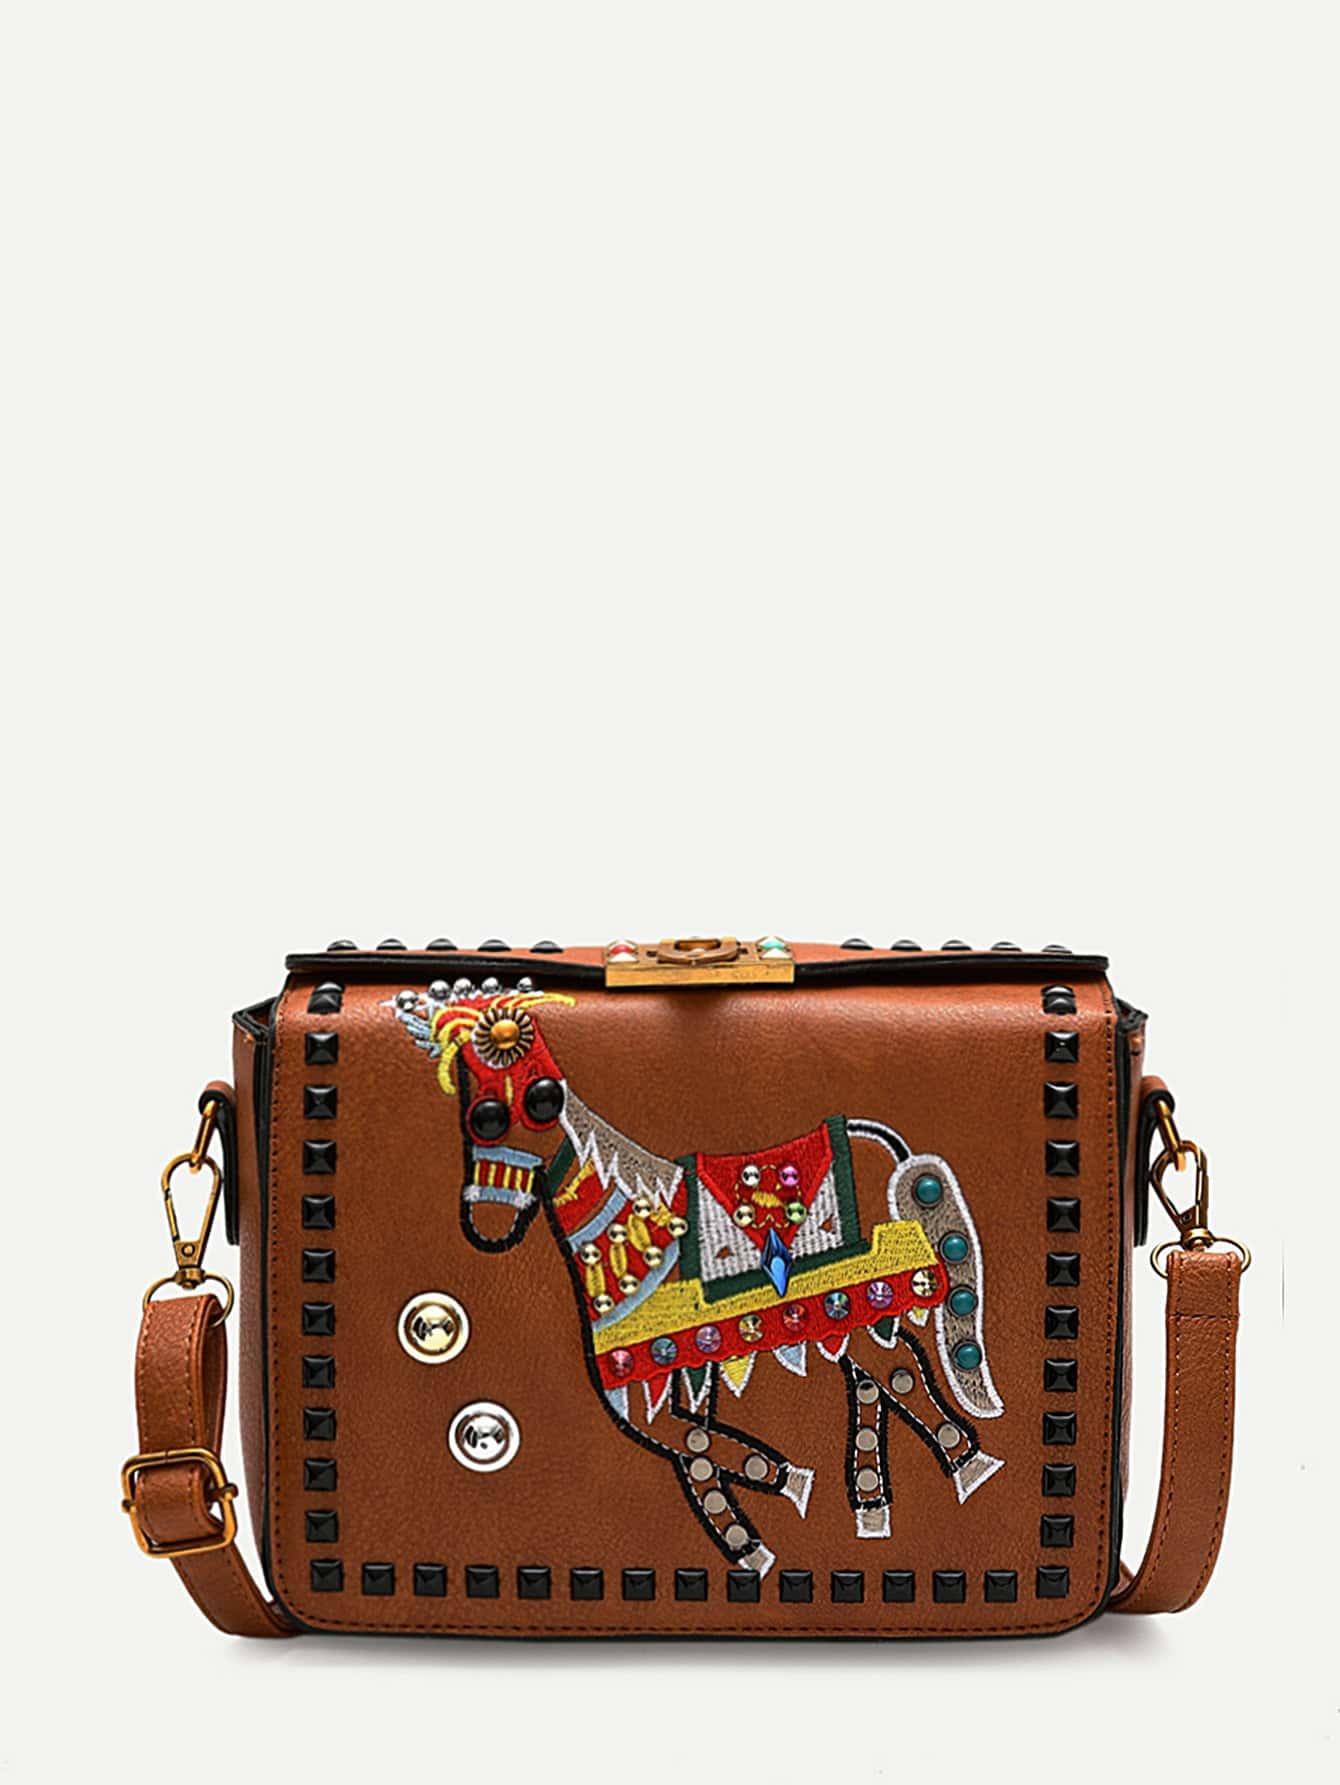 Studded Decor Horse Embroidered Crossbody Bag